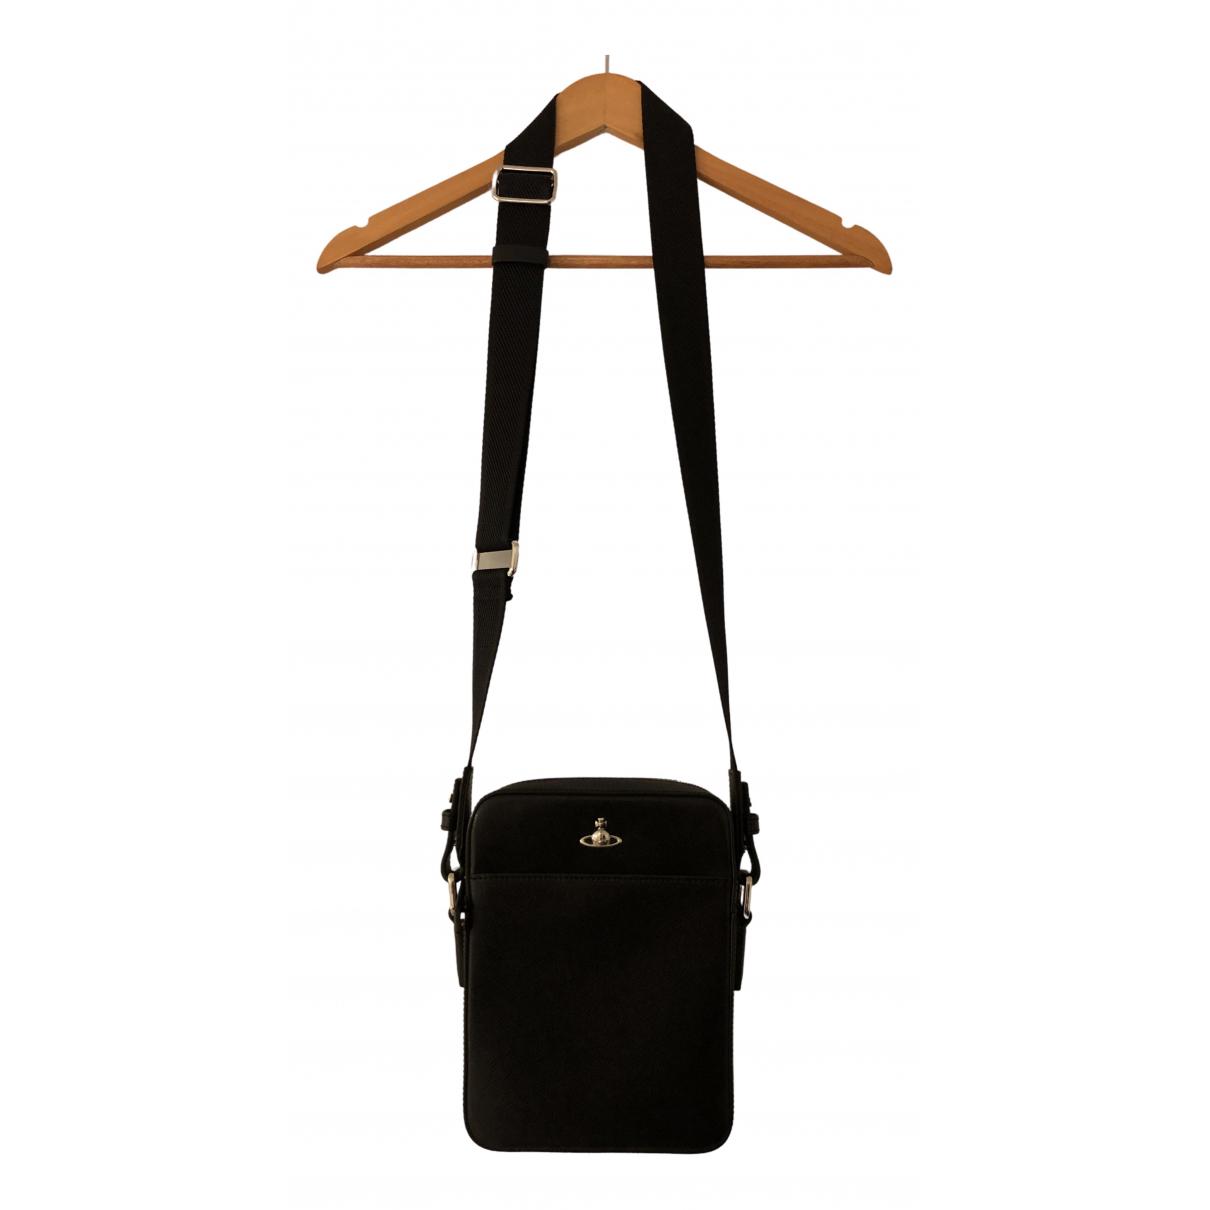 Vivienne Westwood N Black Leather Clutch bag for Women N